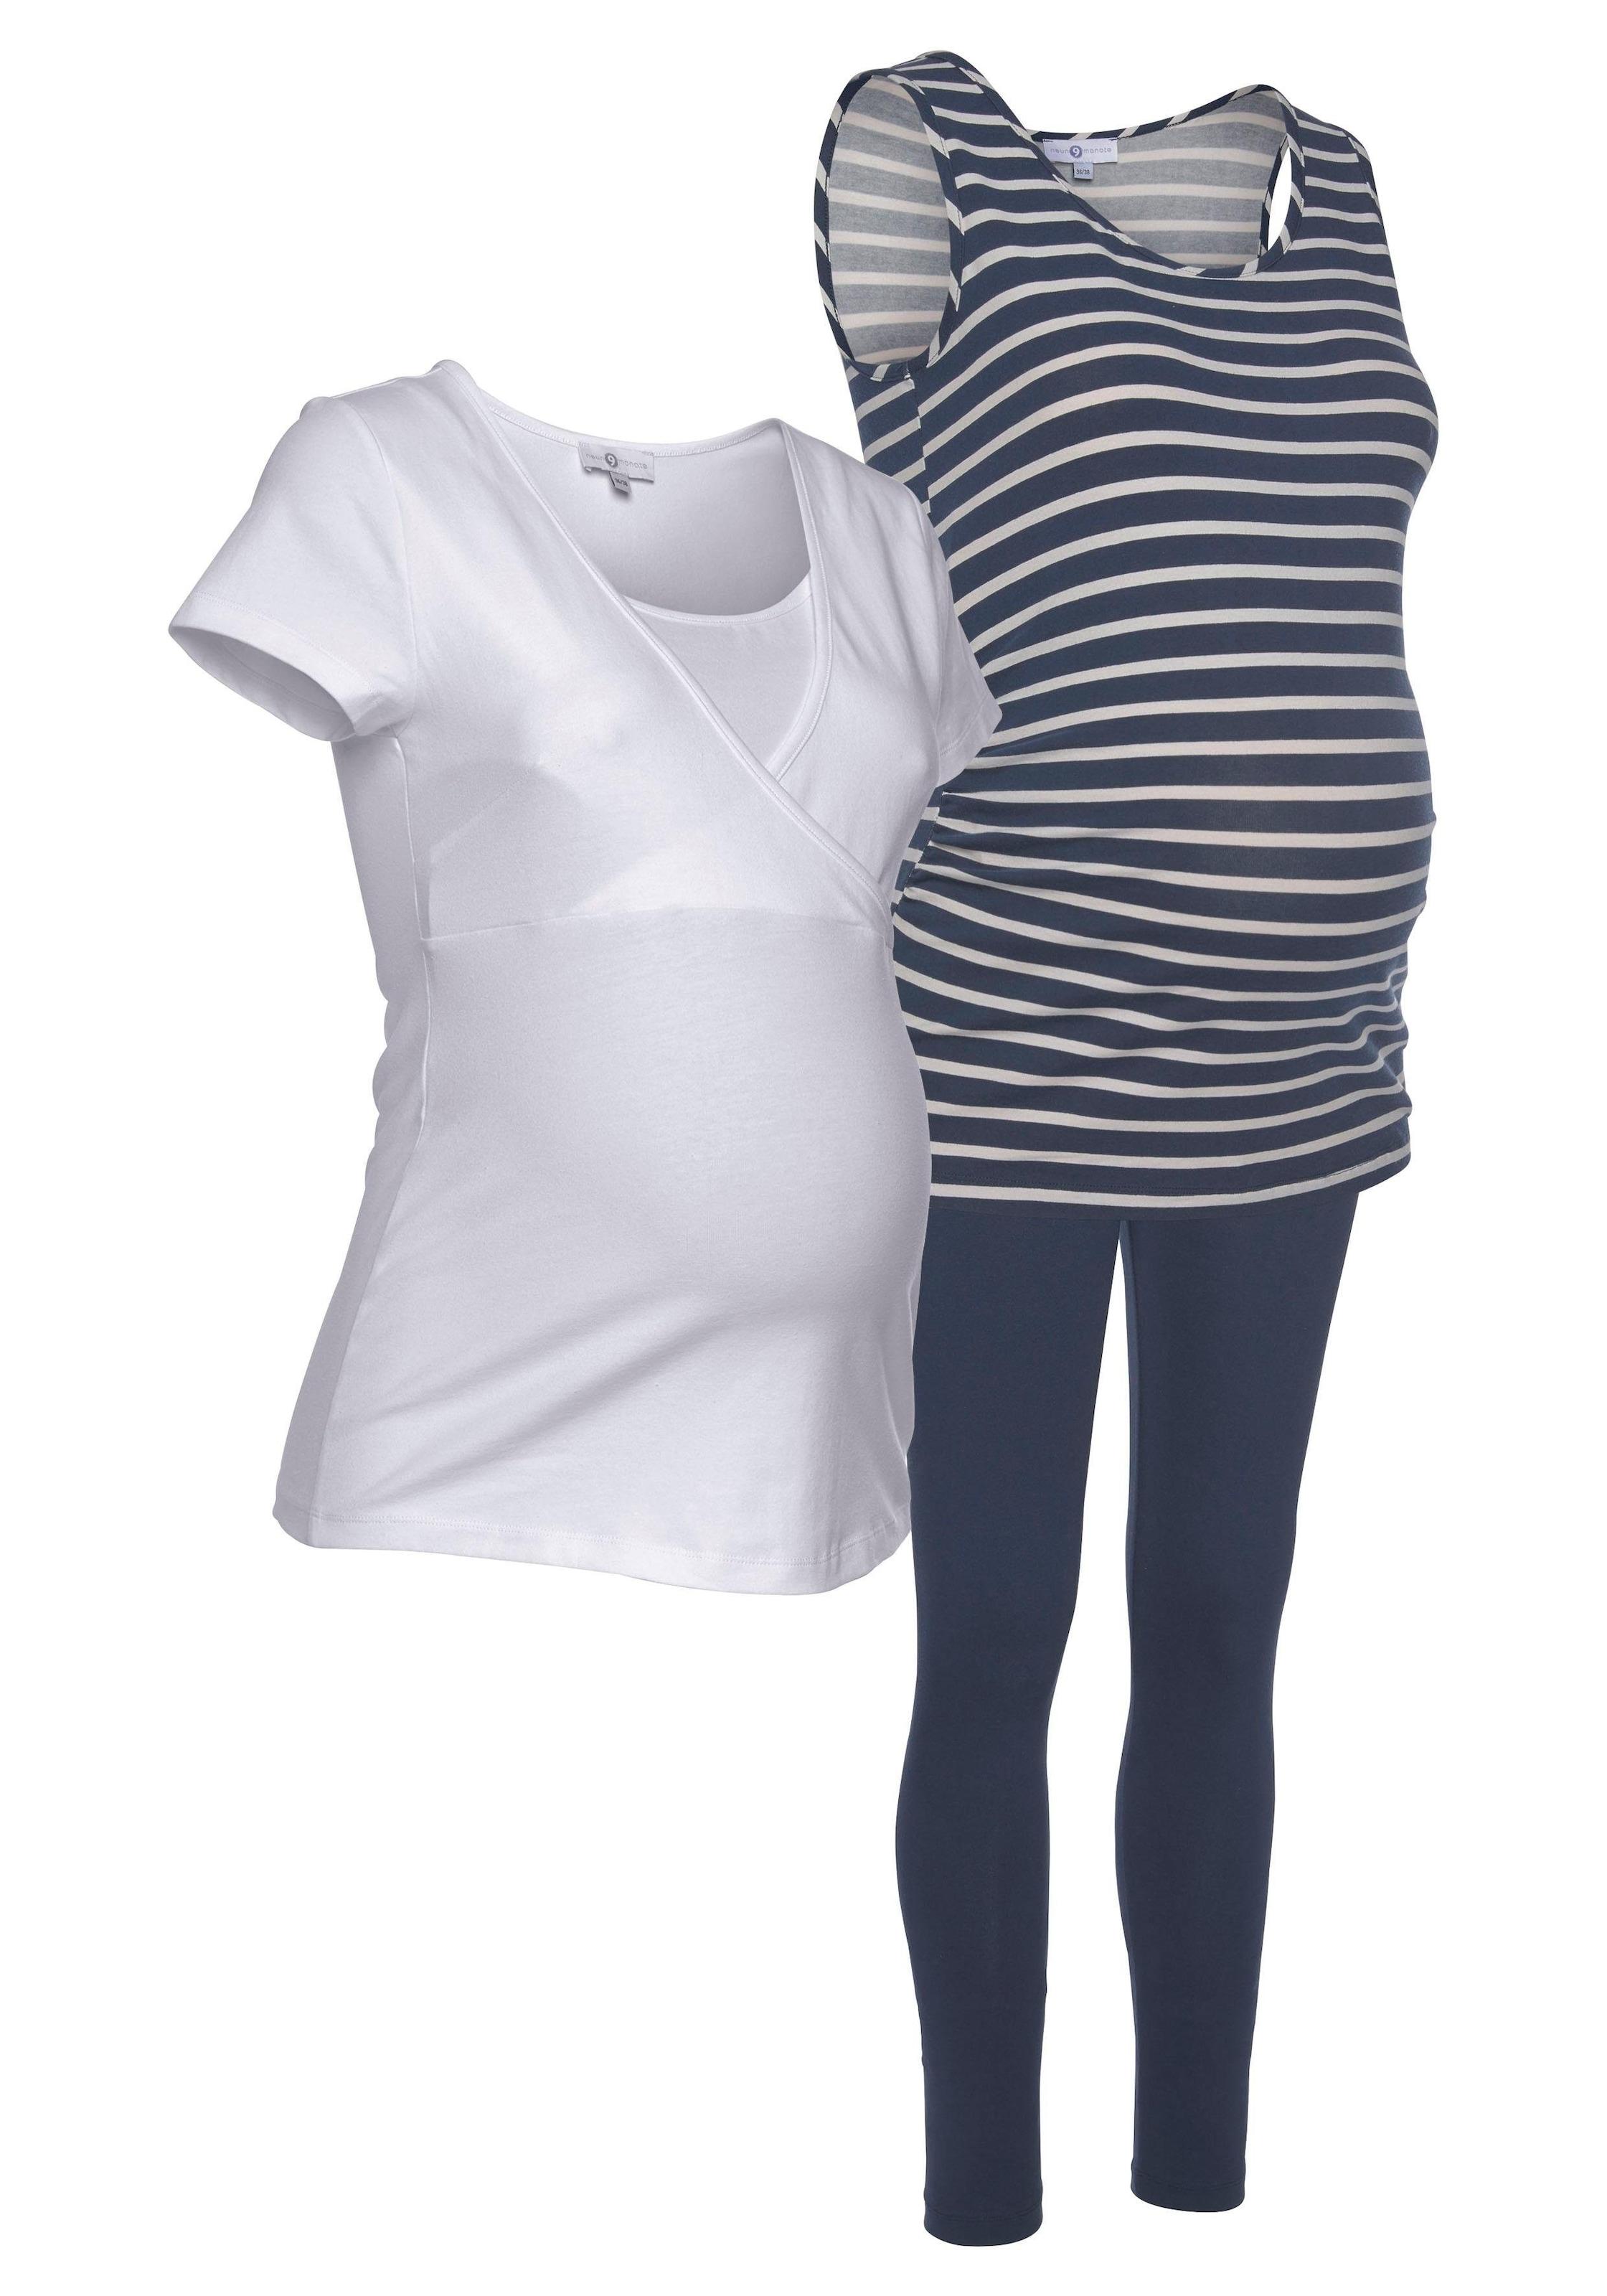 Umstandsmode Ultraschall Metal Hand Baby T-Shirt schwarz M